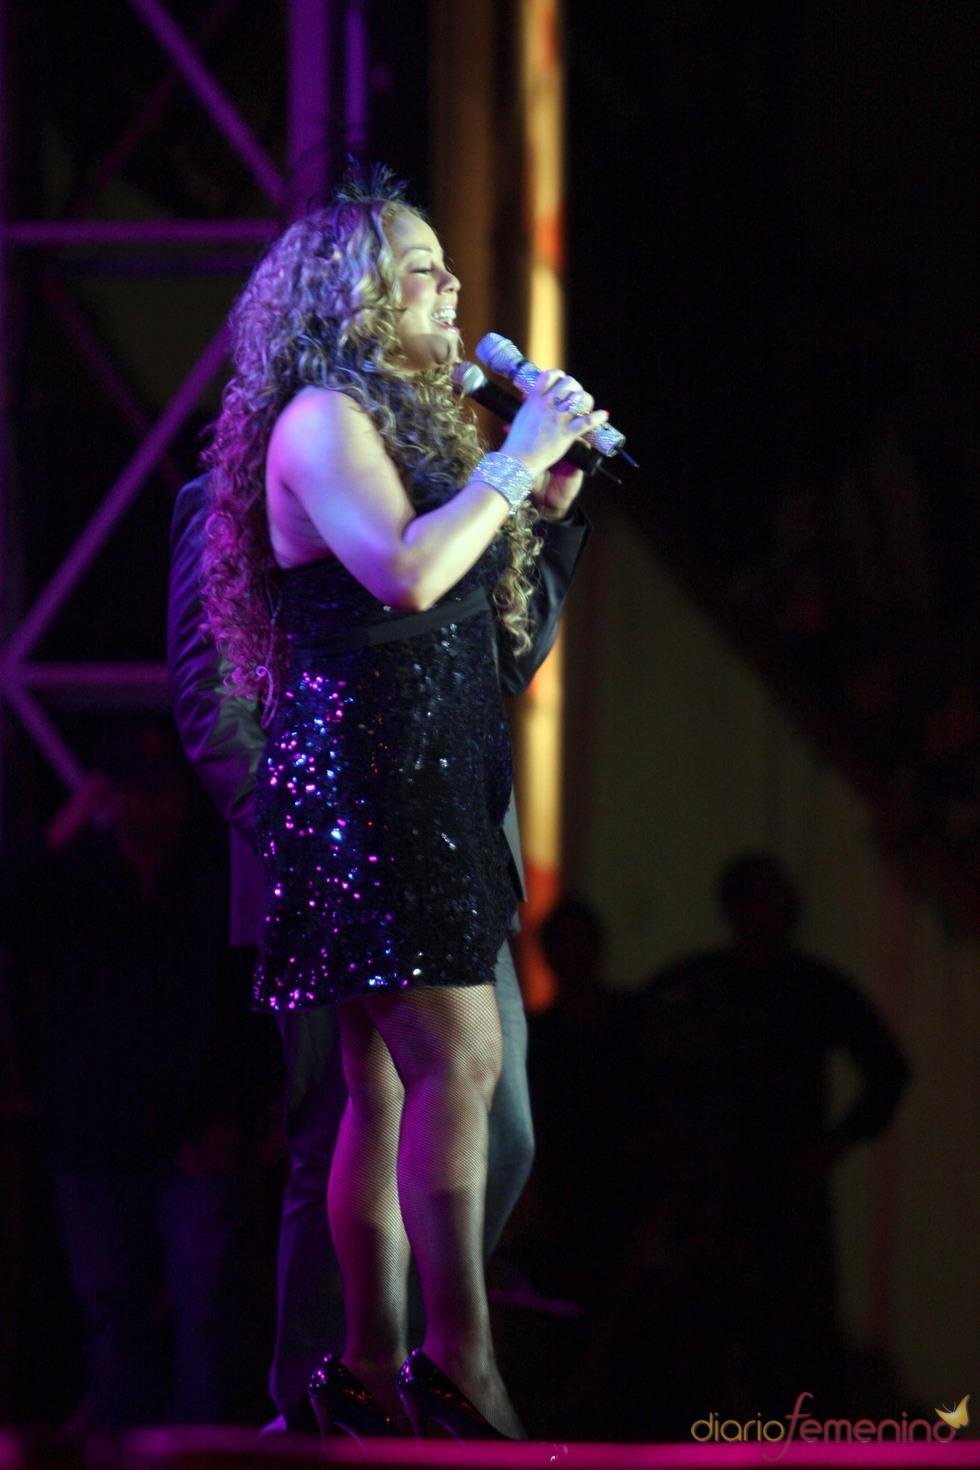 Mariah Carey: embarazada o con sobrepeso